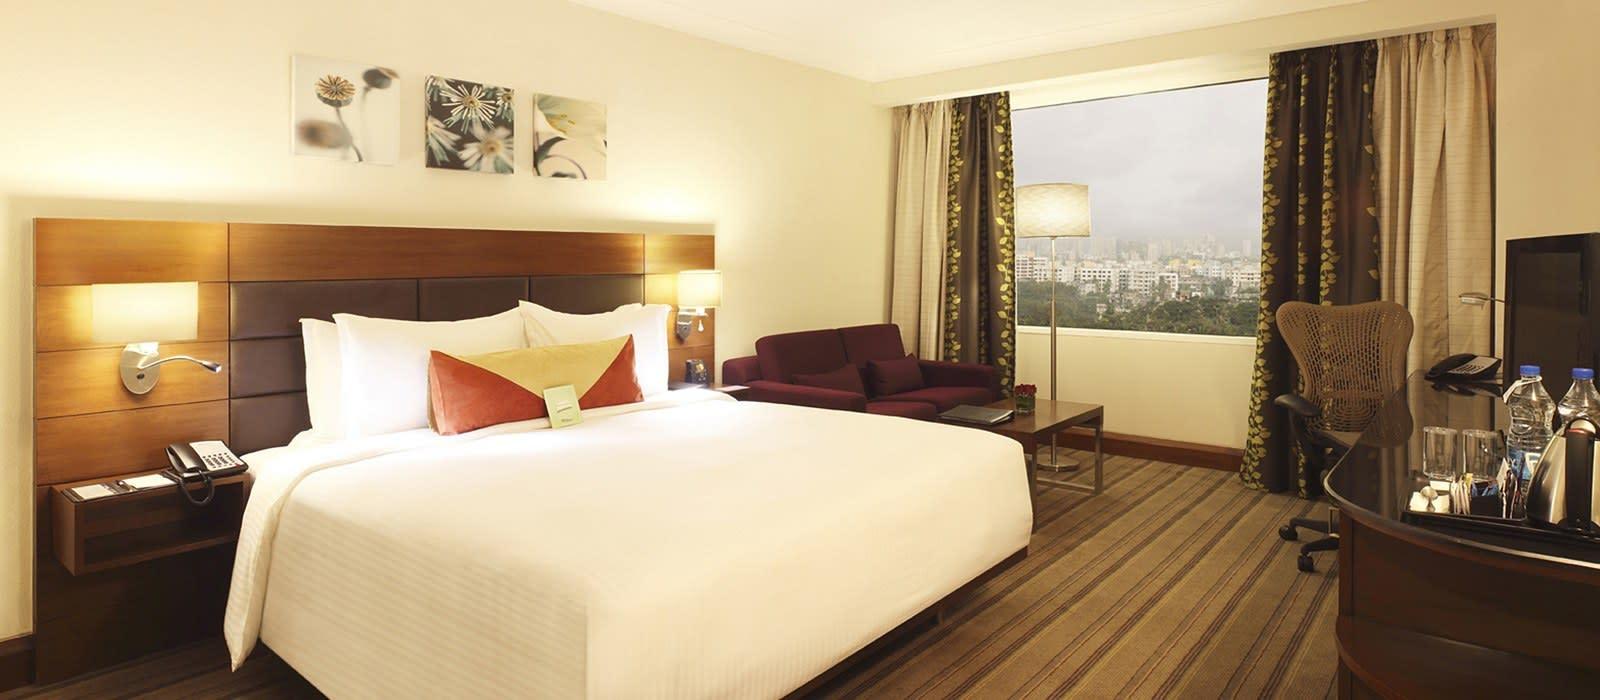 Hotel Hilton Garden Inn North India